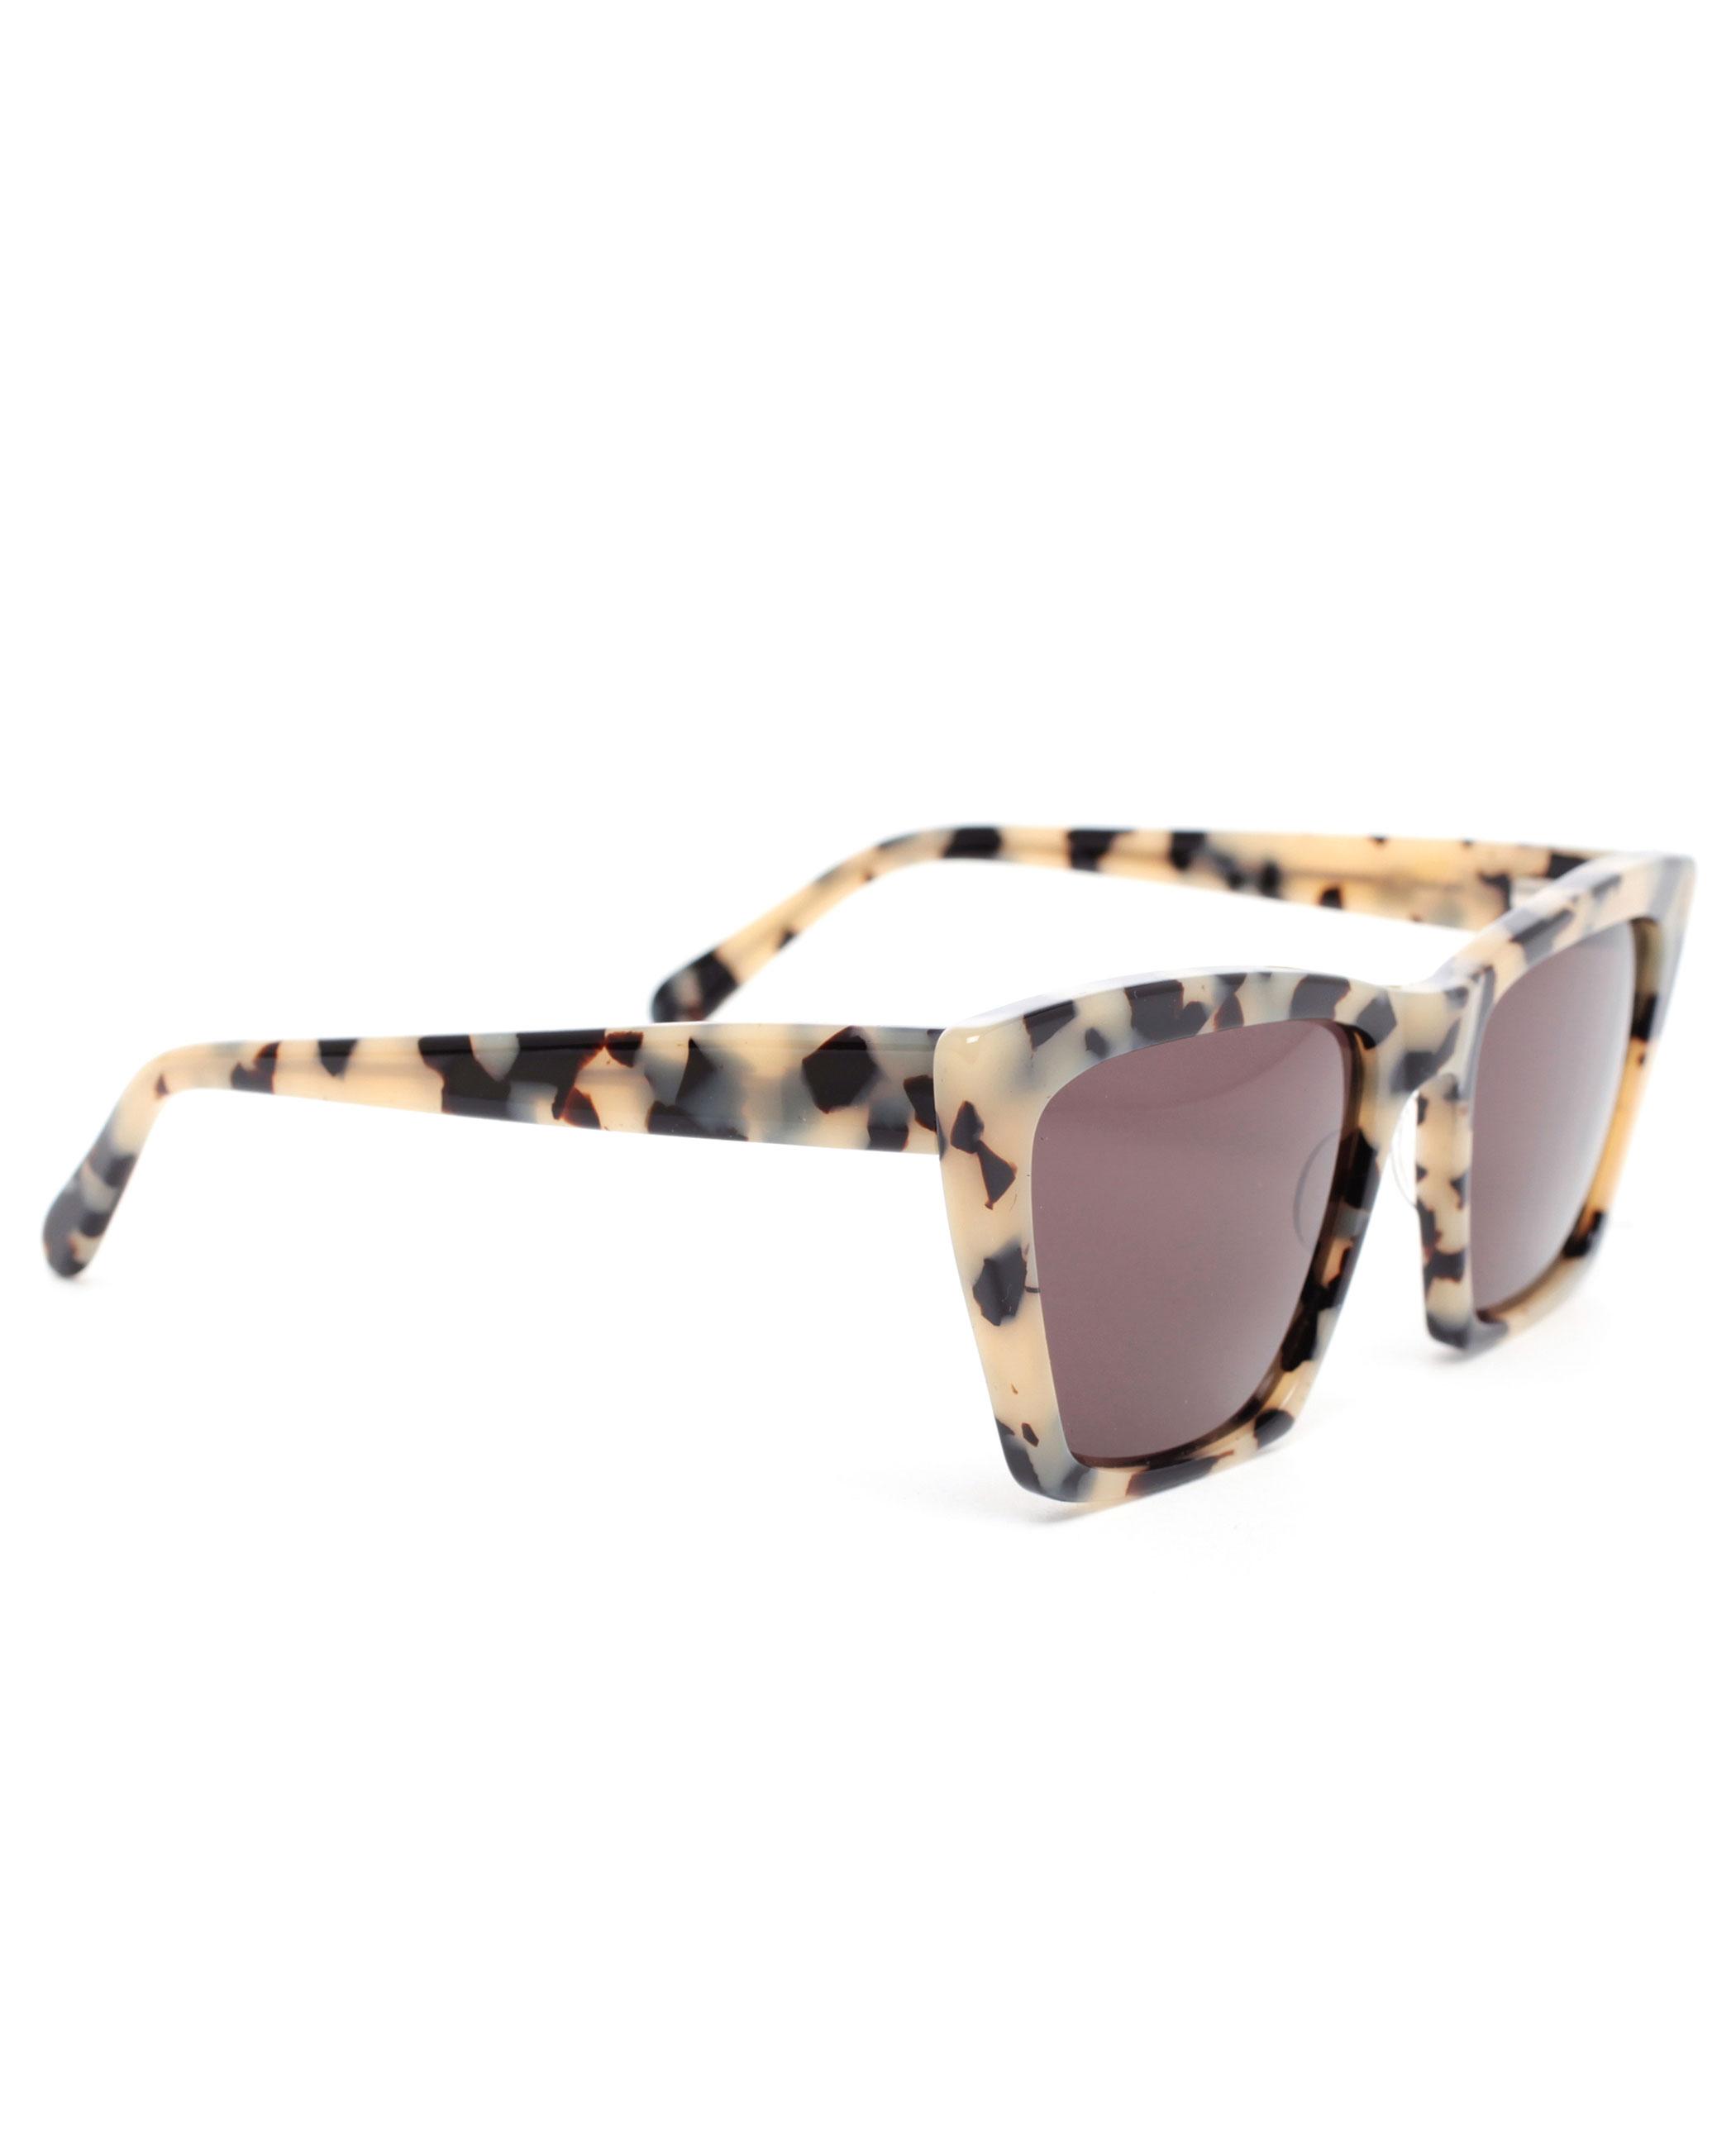 dc26c1d9b1e Tortoise Shell Sunglasses S85s « One More Soul